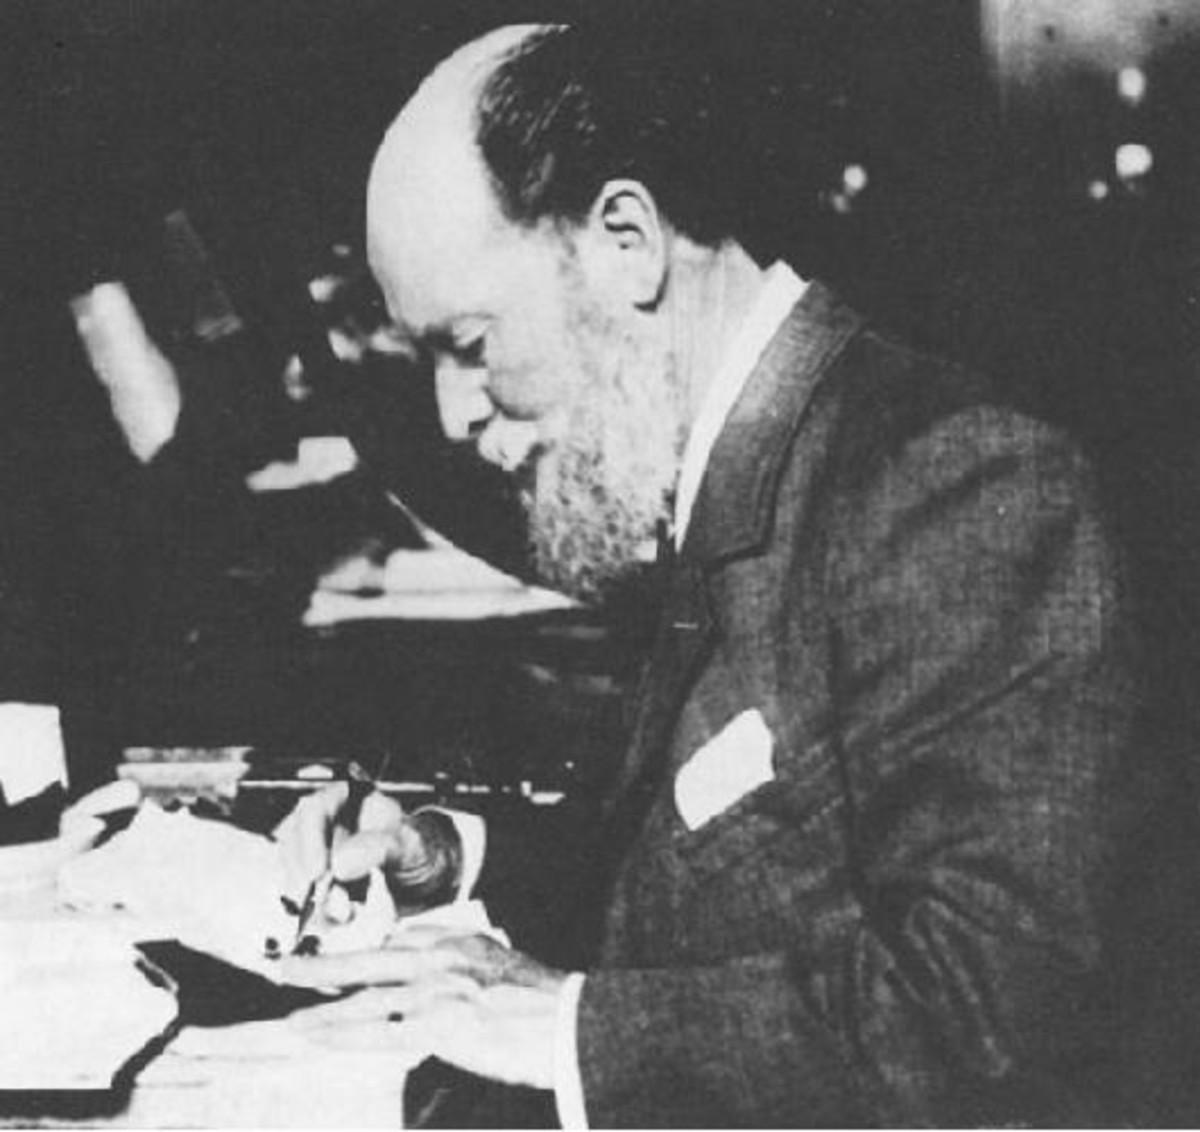 Renowned Russian jeweler Peter Carl Fabergé at work, circa 1900.